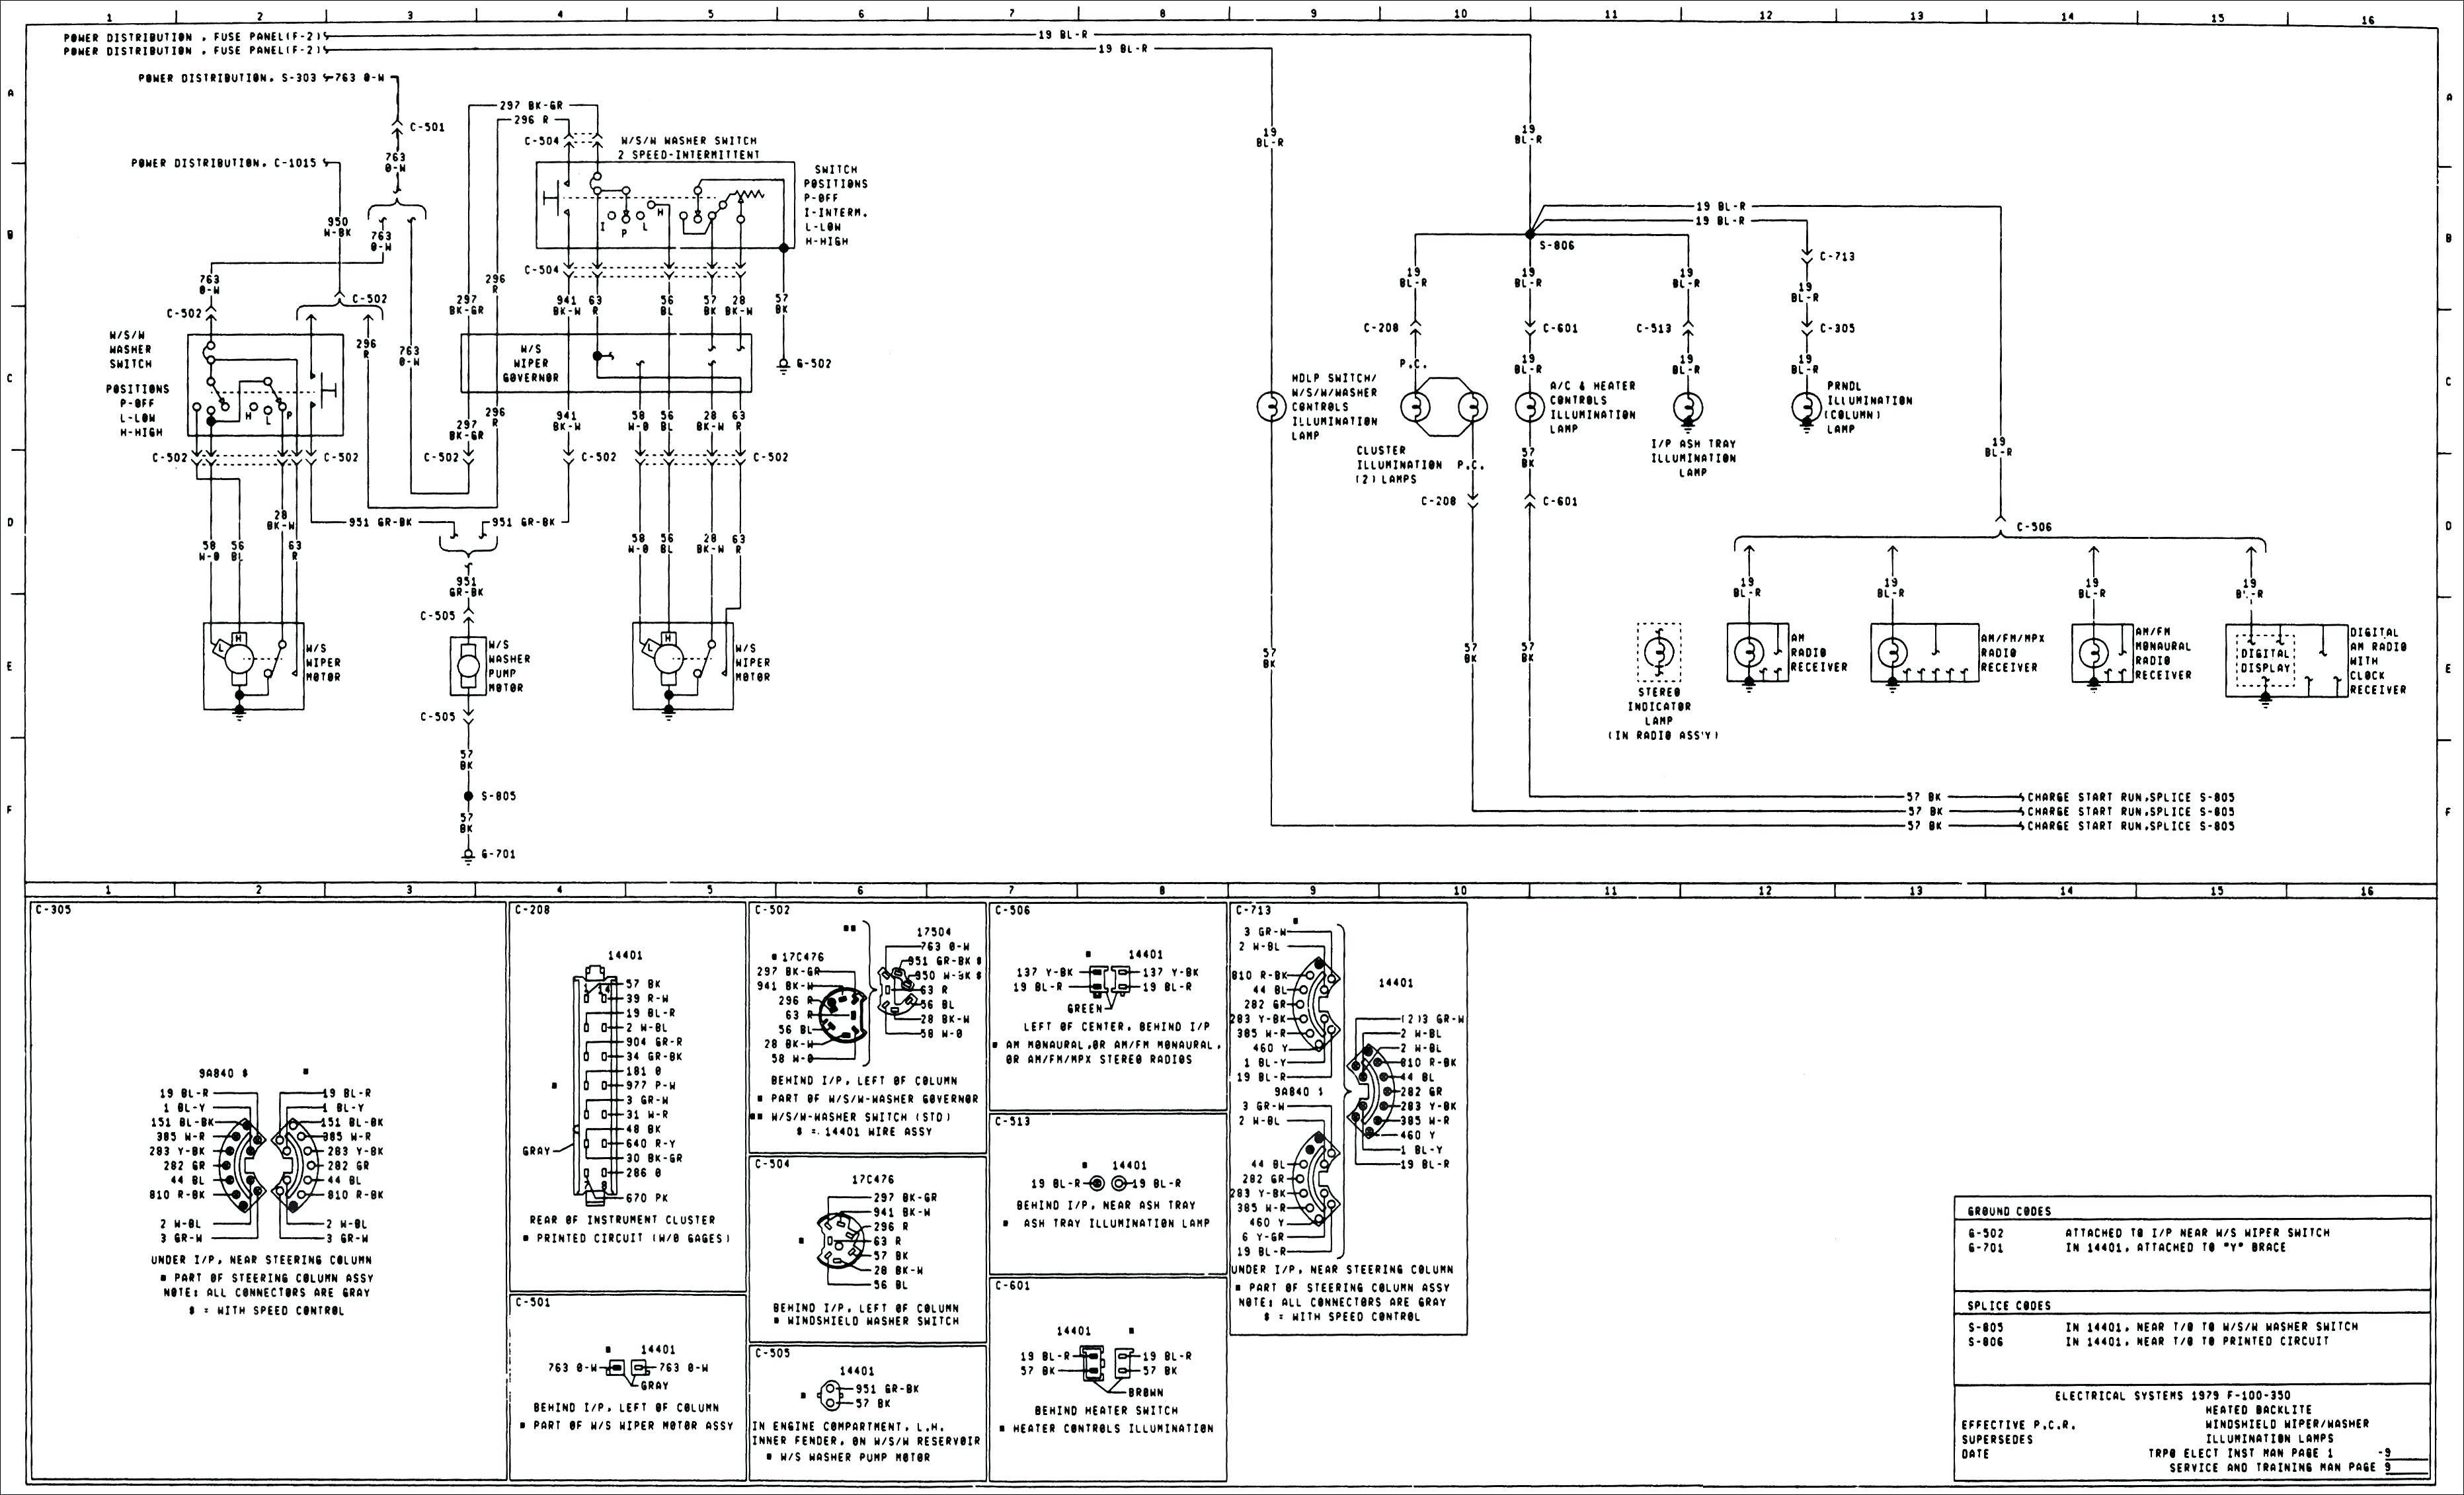 mack truck fuel system diagram engine wiring diagram mack truck free truck wiring schematics engine wiring diagram mack truck free download kohler cv15s diagrams